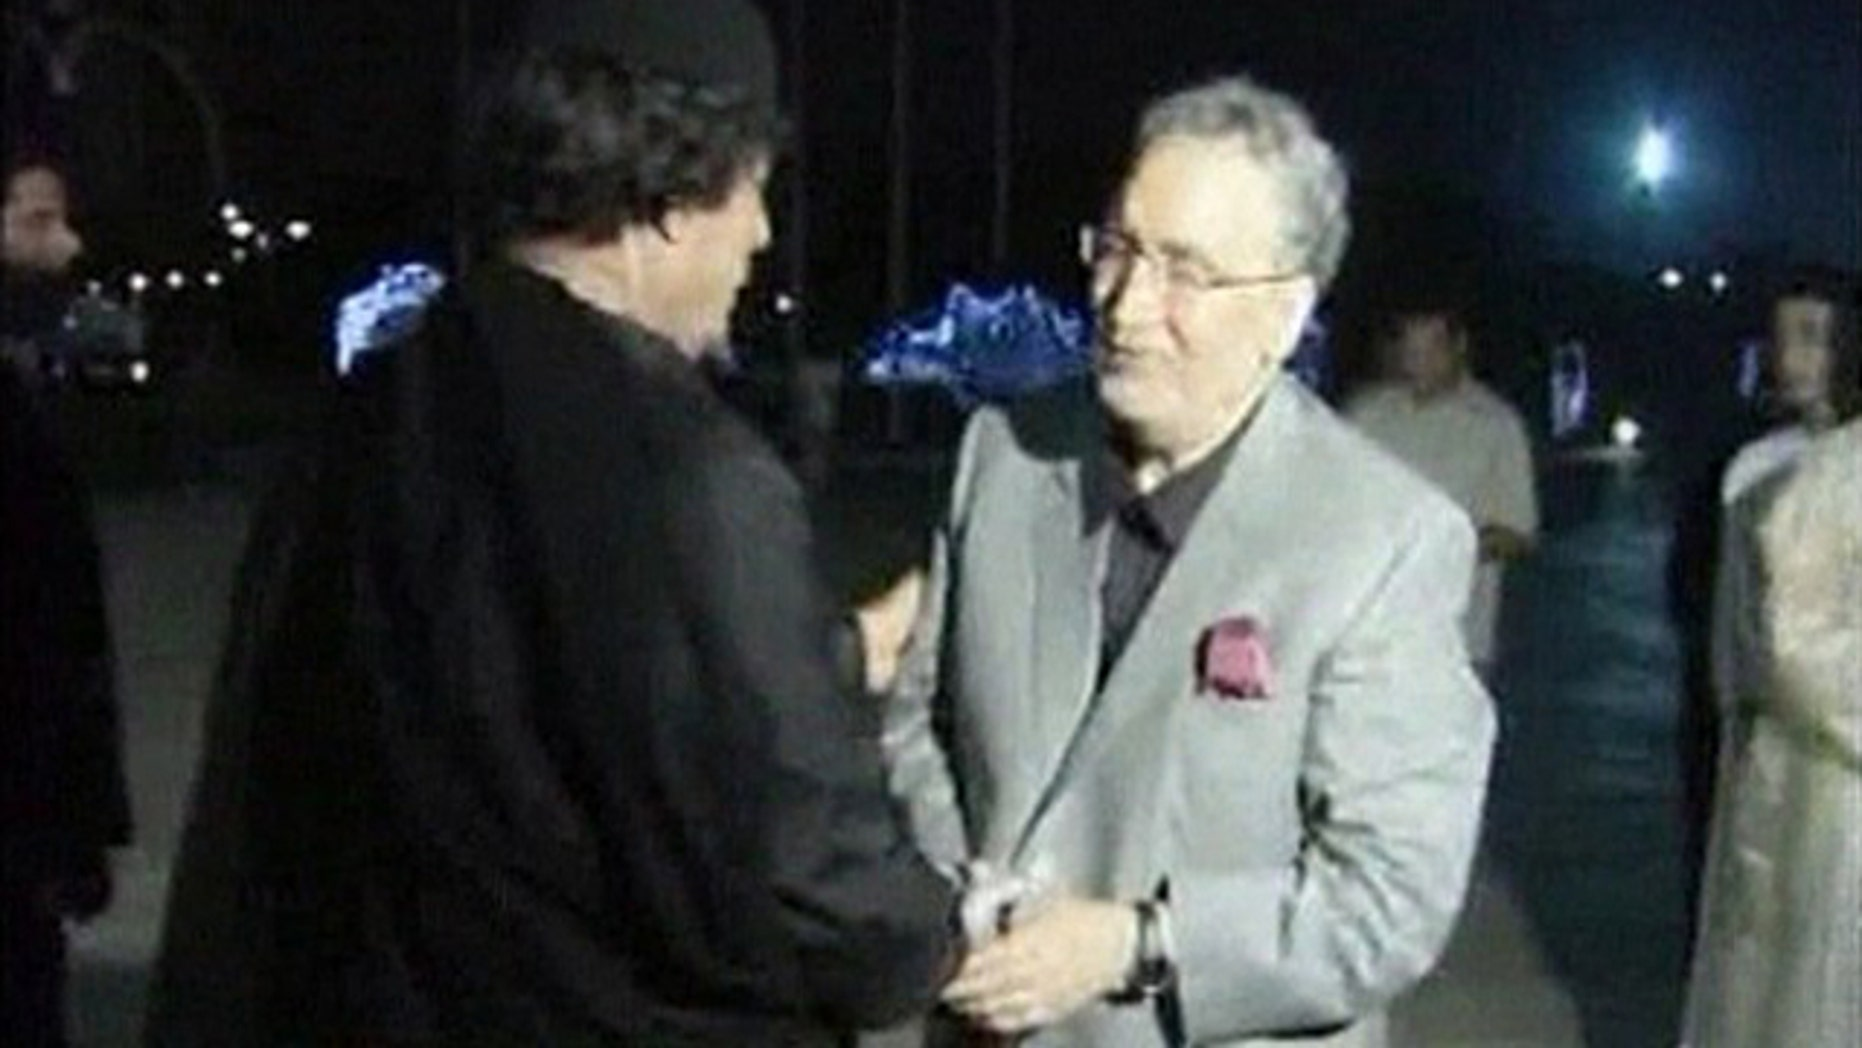 Aug. 21, 2009: Convicted Lockerbie bomber Abdelbaset al-Megrahi shakes the hand of Libyan leader Muammar Qaddafi in Tripoli in this image from Libya TV. (Reuters)